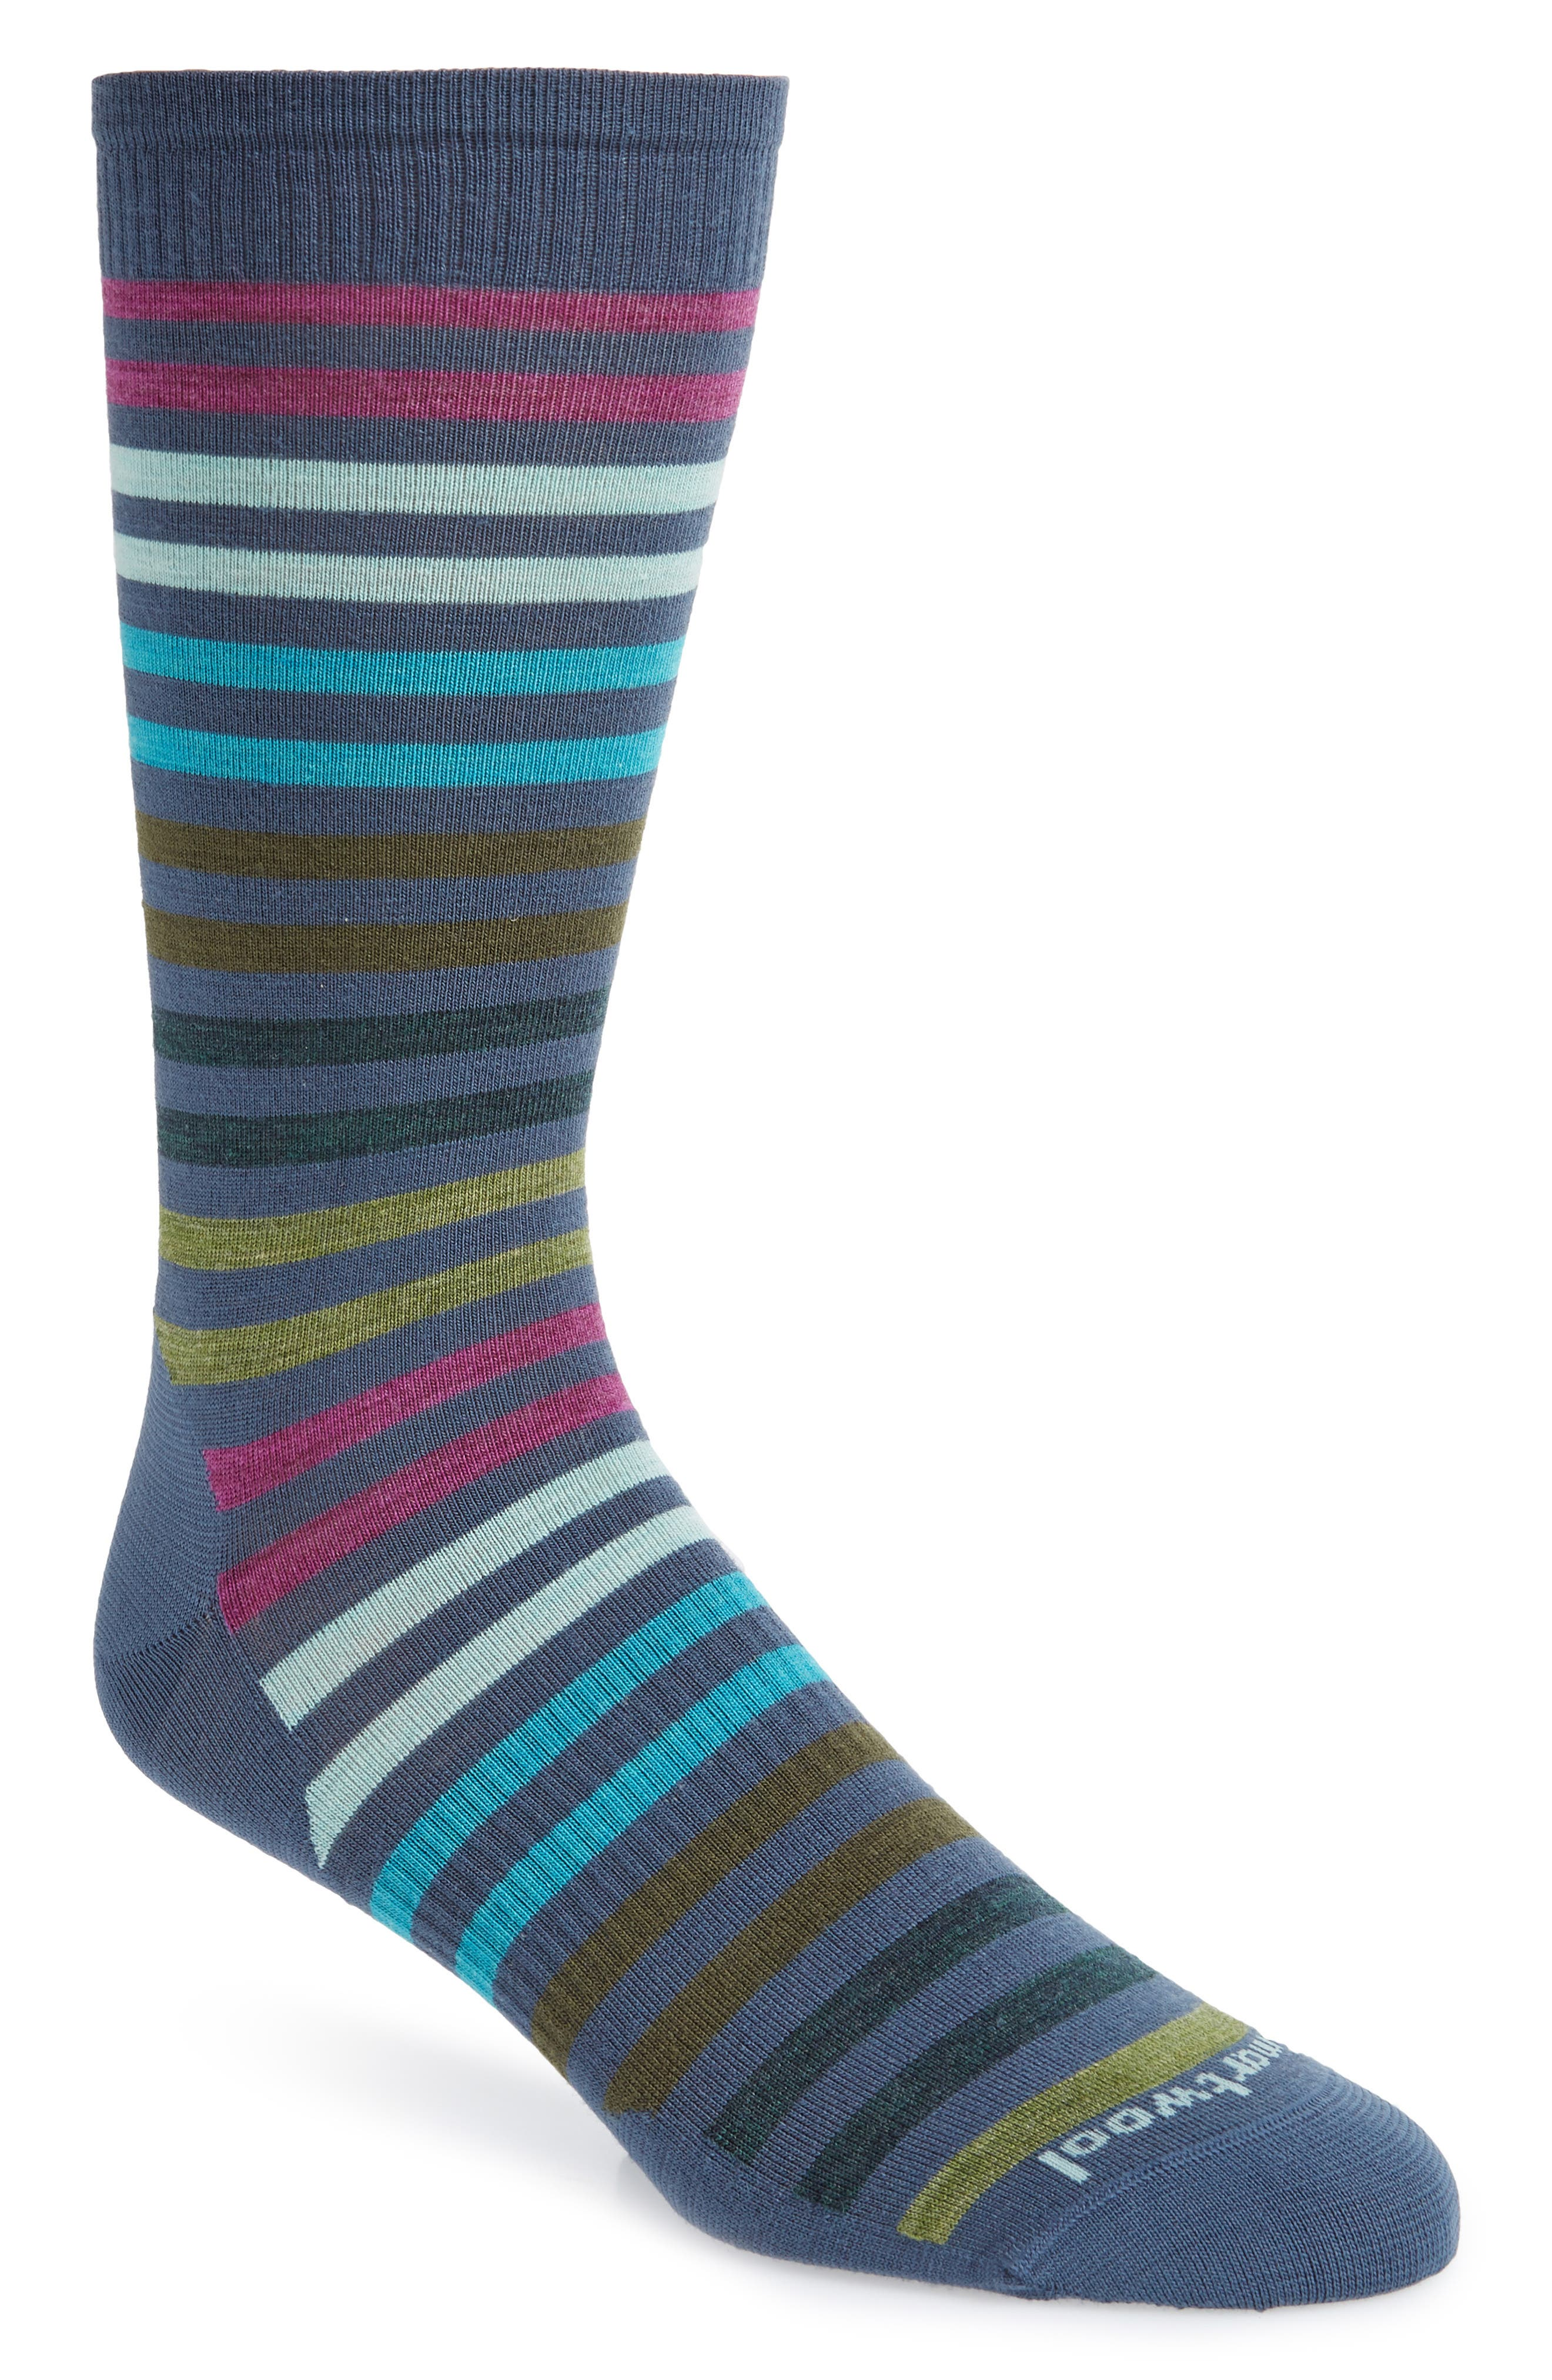 'Spruce Street' Stripe Merino Wool Blend Socks,                         Main,                         color, DARK BLUE STEEL HEATHER